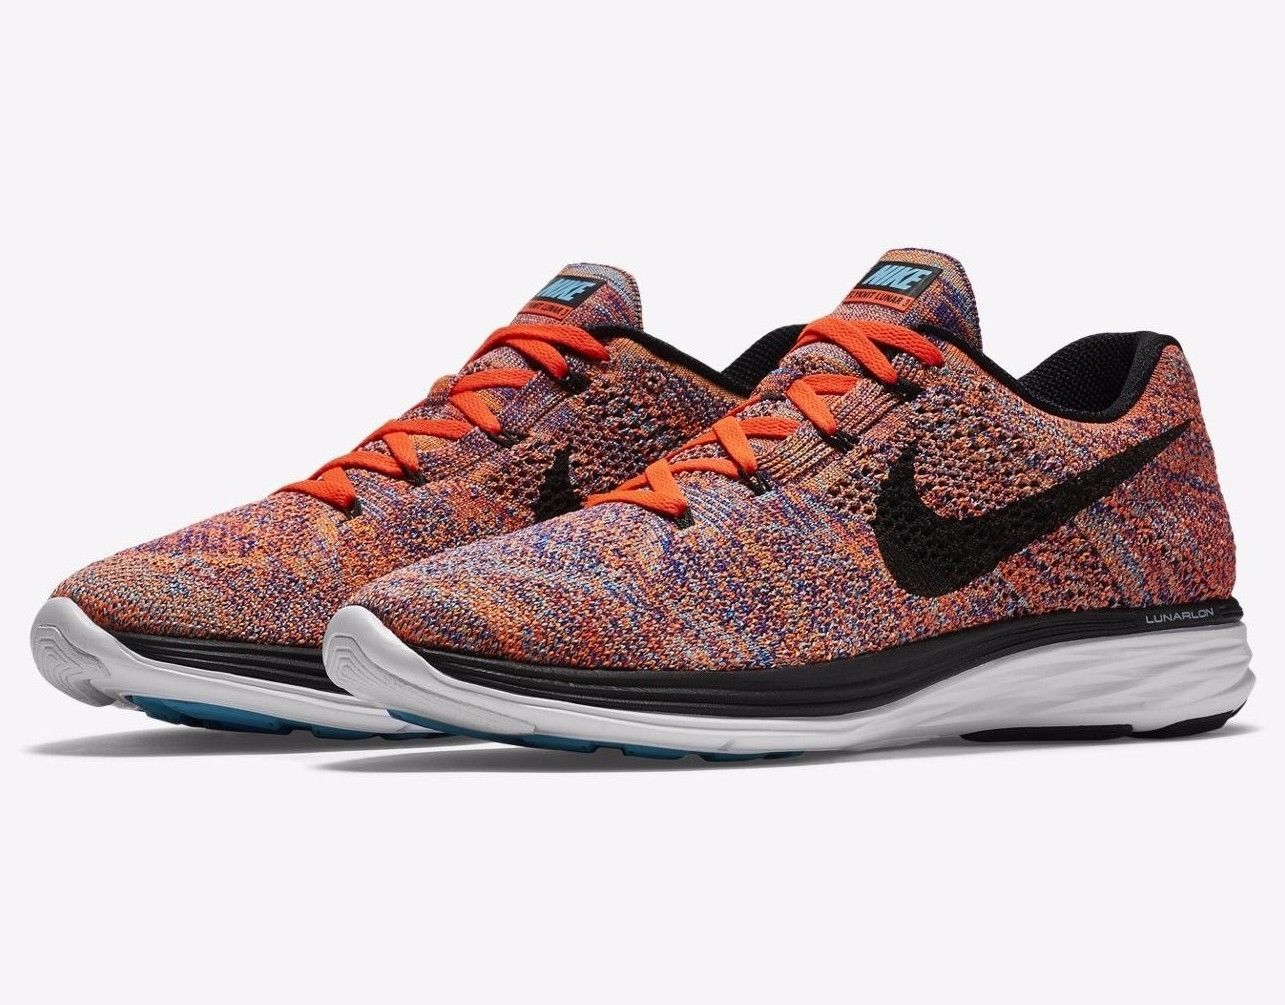 e6402349bc2 Men's Nike Flyknit Lunar 3 Running Shoes Crimson Concord 698181 406 Size  10.5